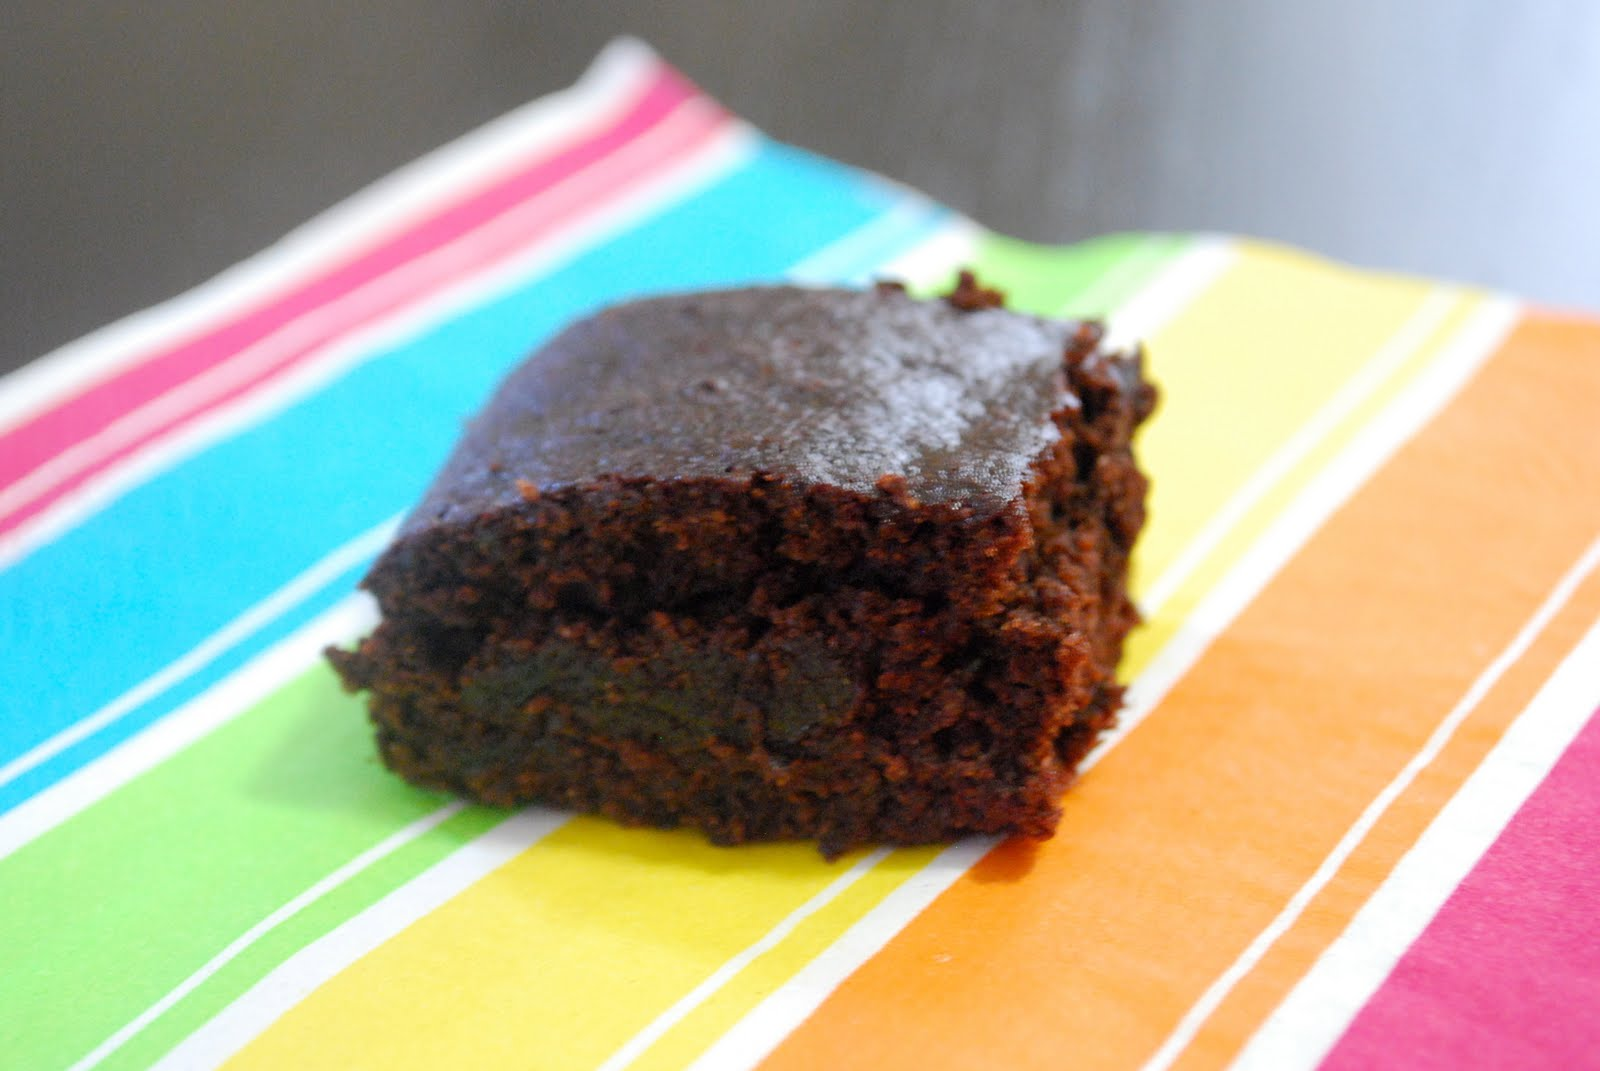 Krista's Allergy-Free Kitchen: Allergy Free Brownies ...